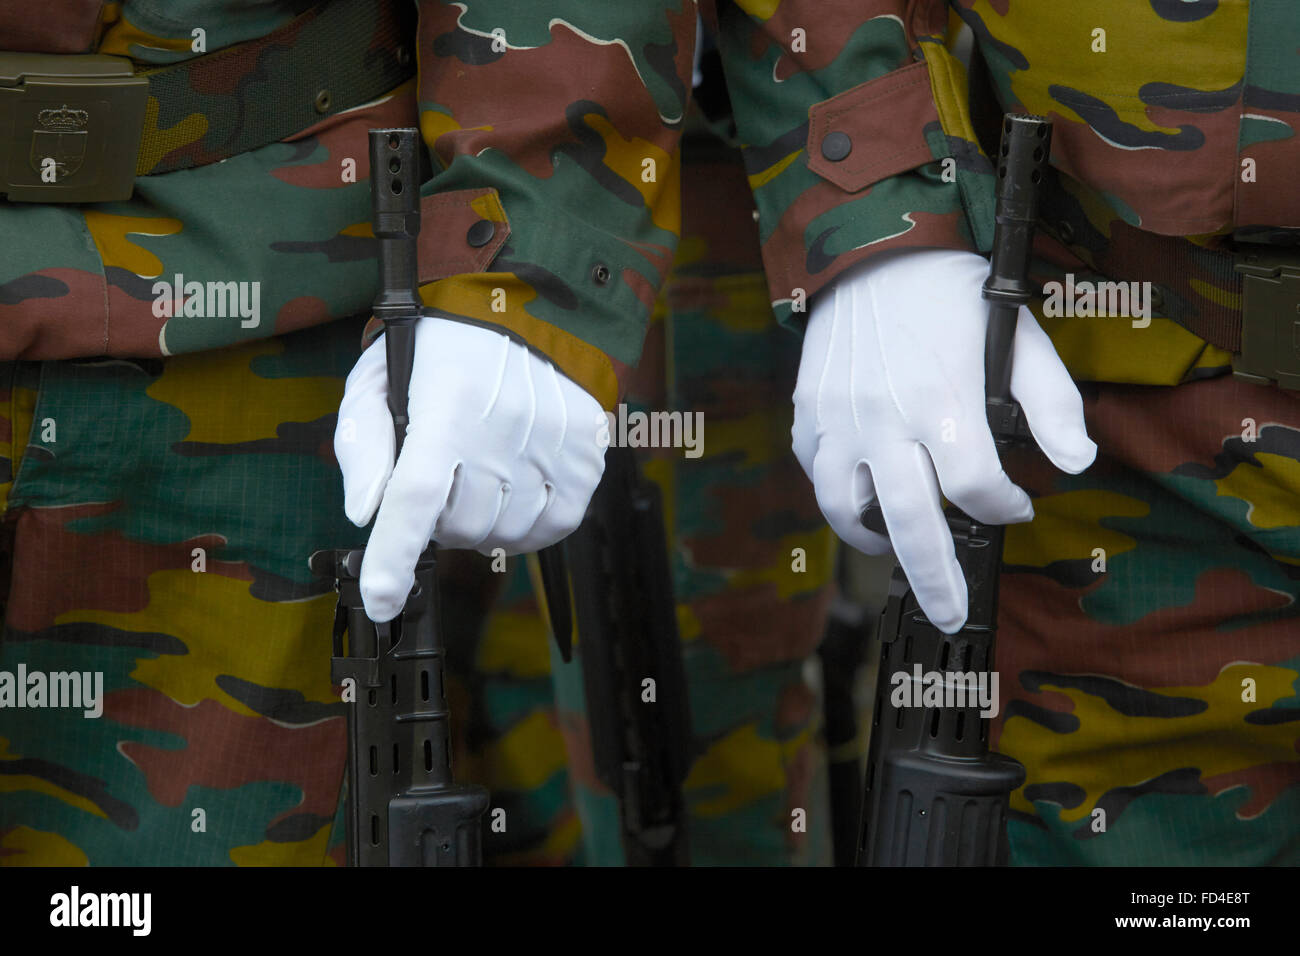 Belgian military - Stock Image